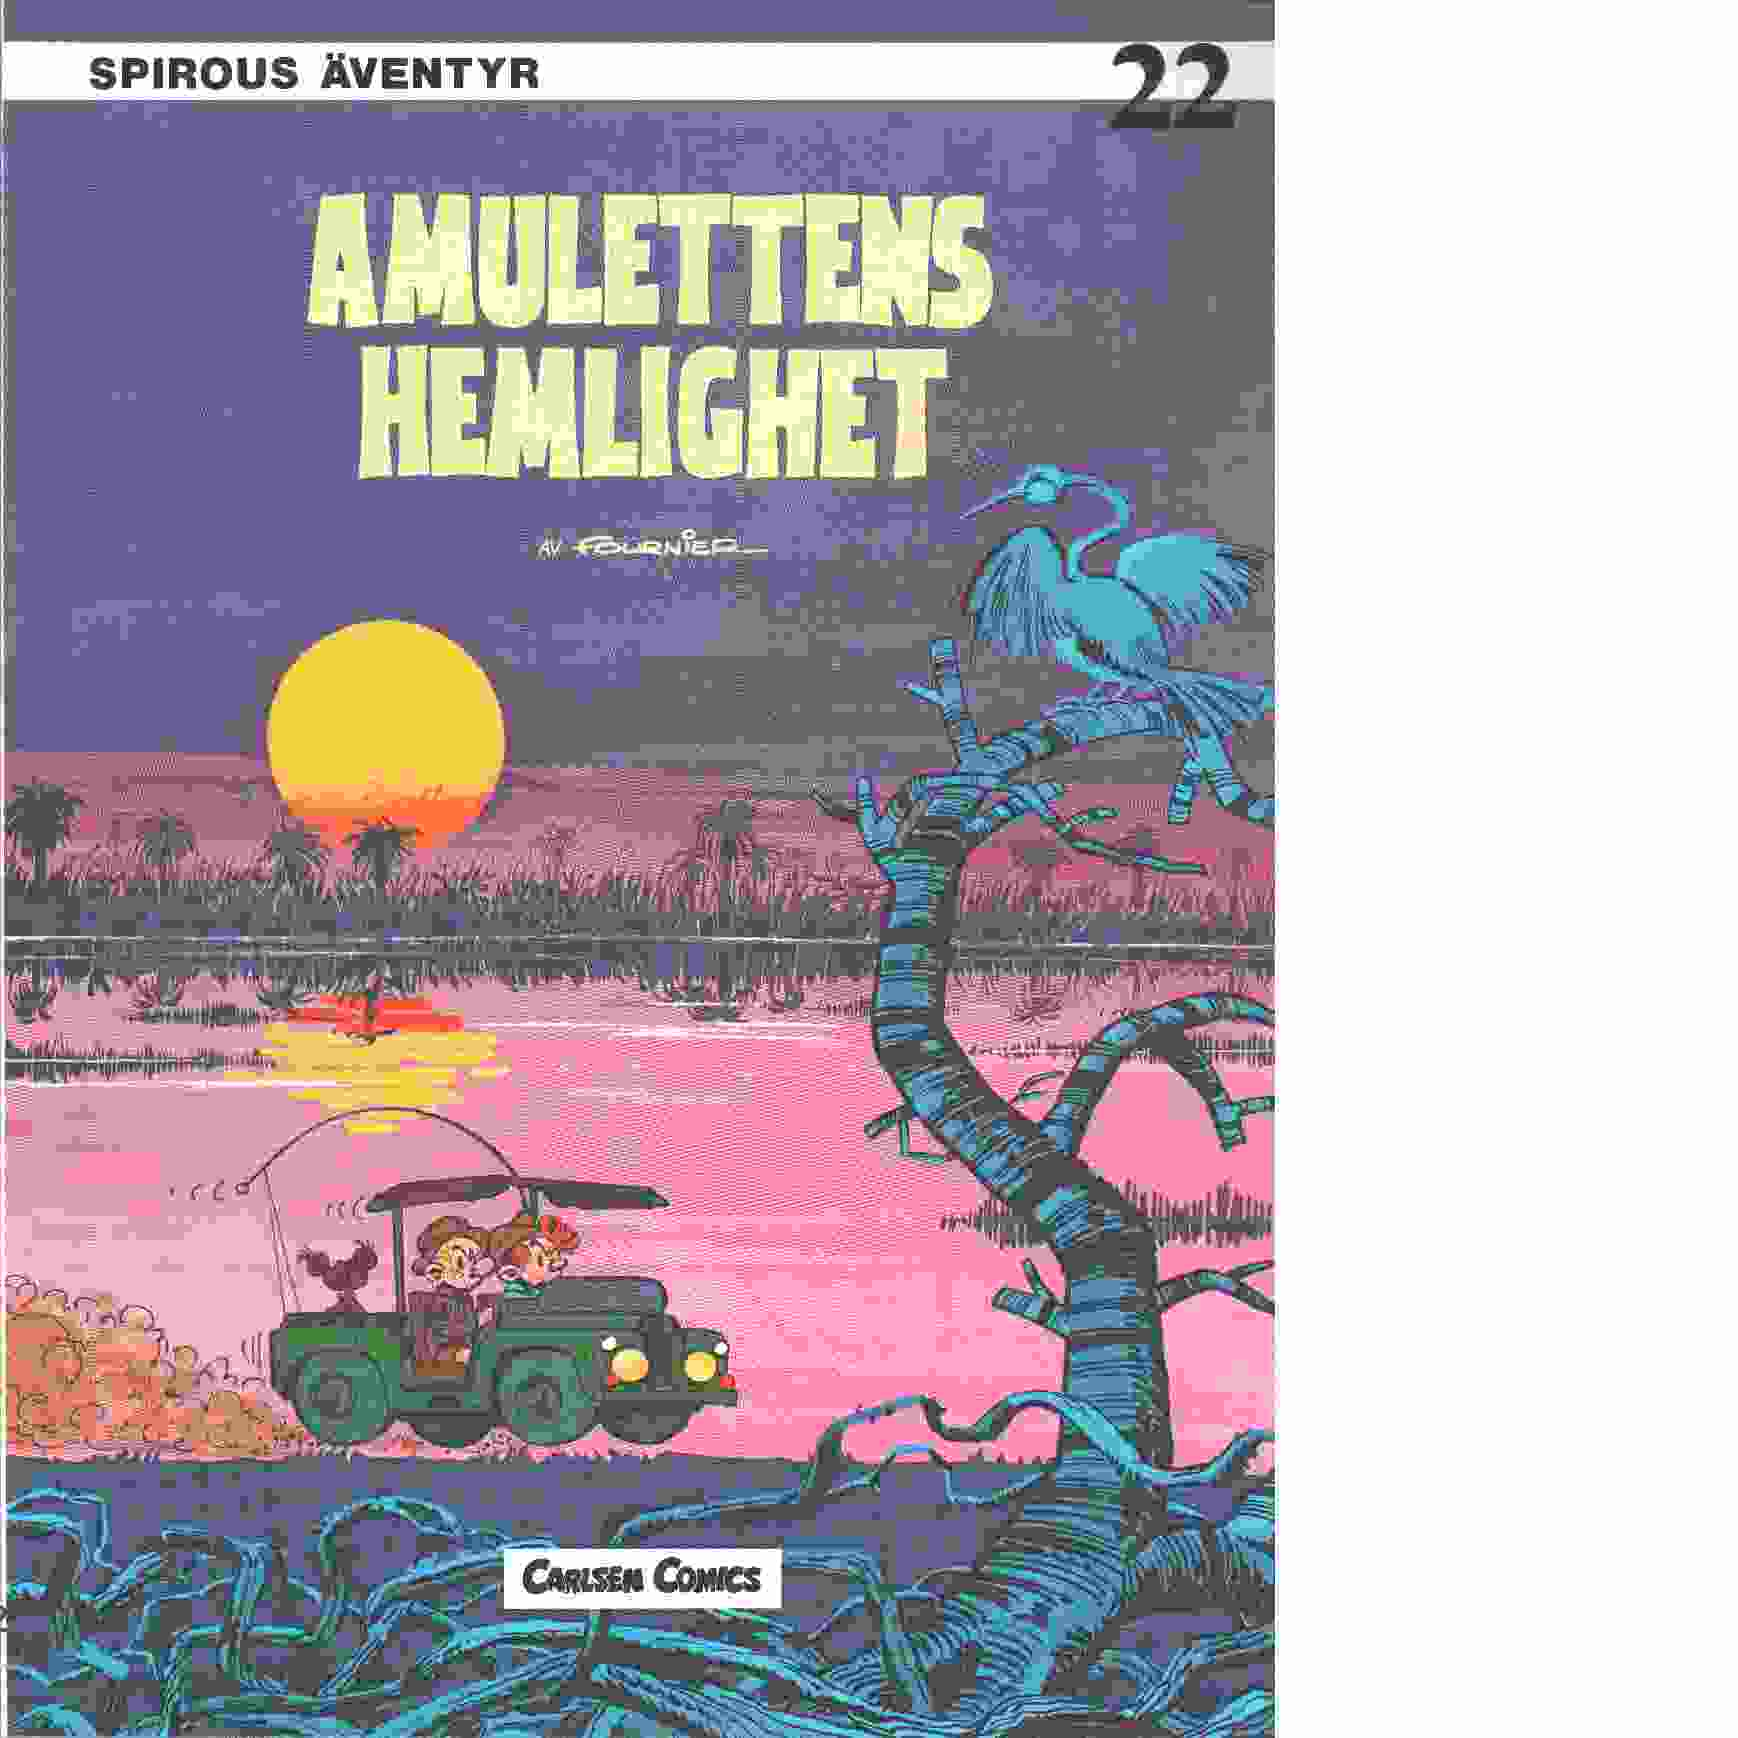 Spirous äventyr 22 : Amulettens hemlighet - Fournier, Jean Claude och Franquin, André